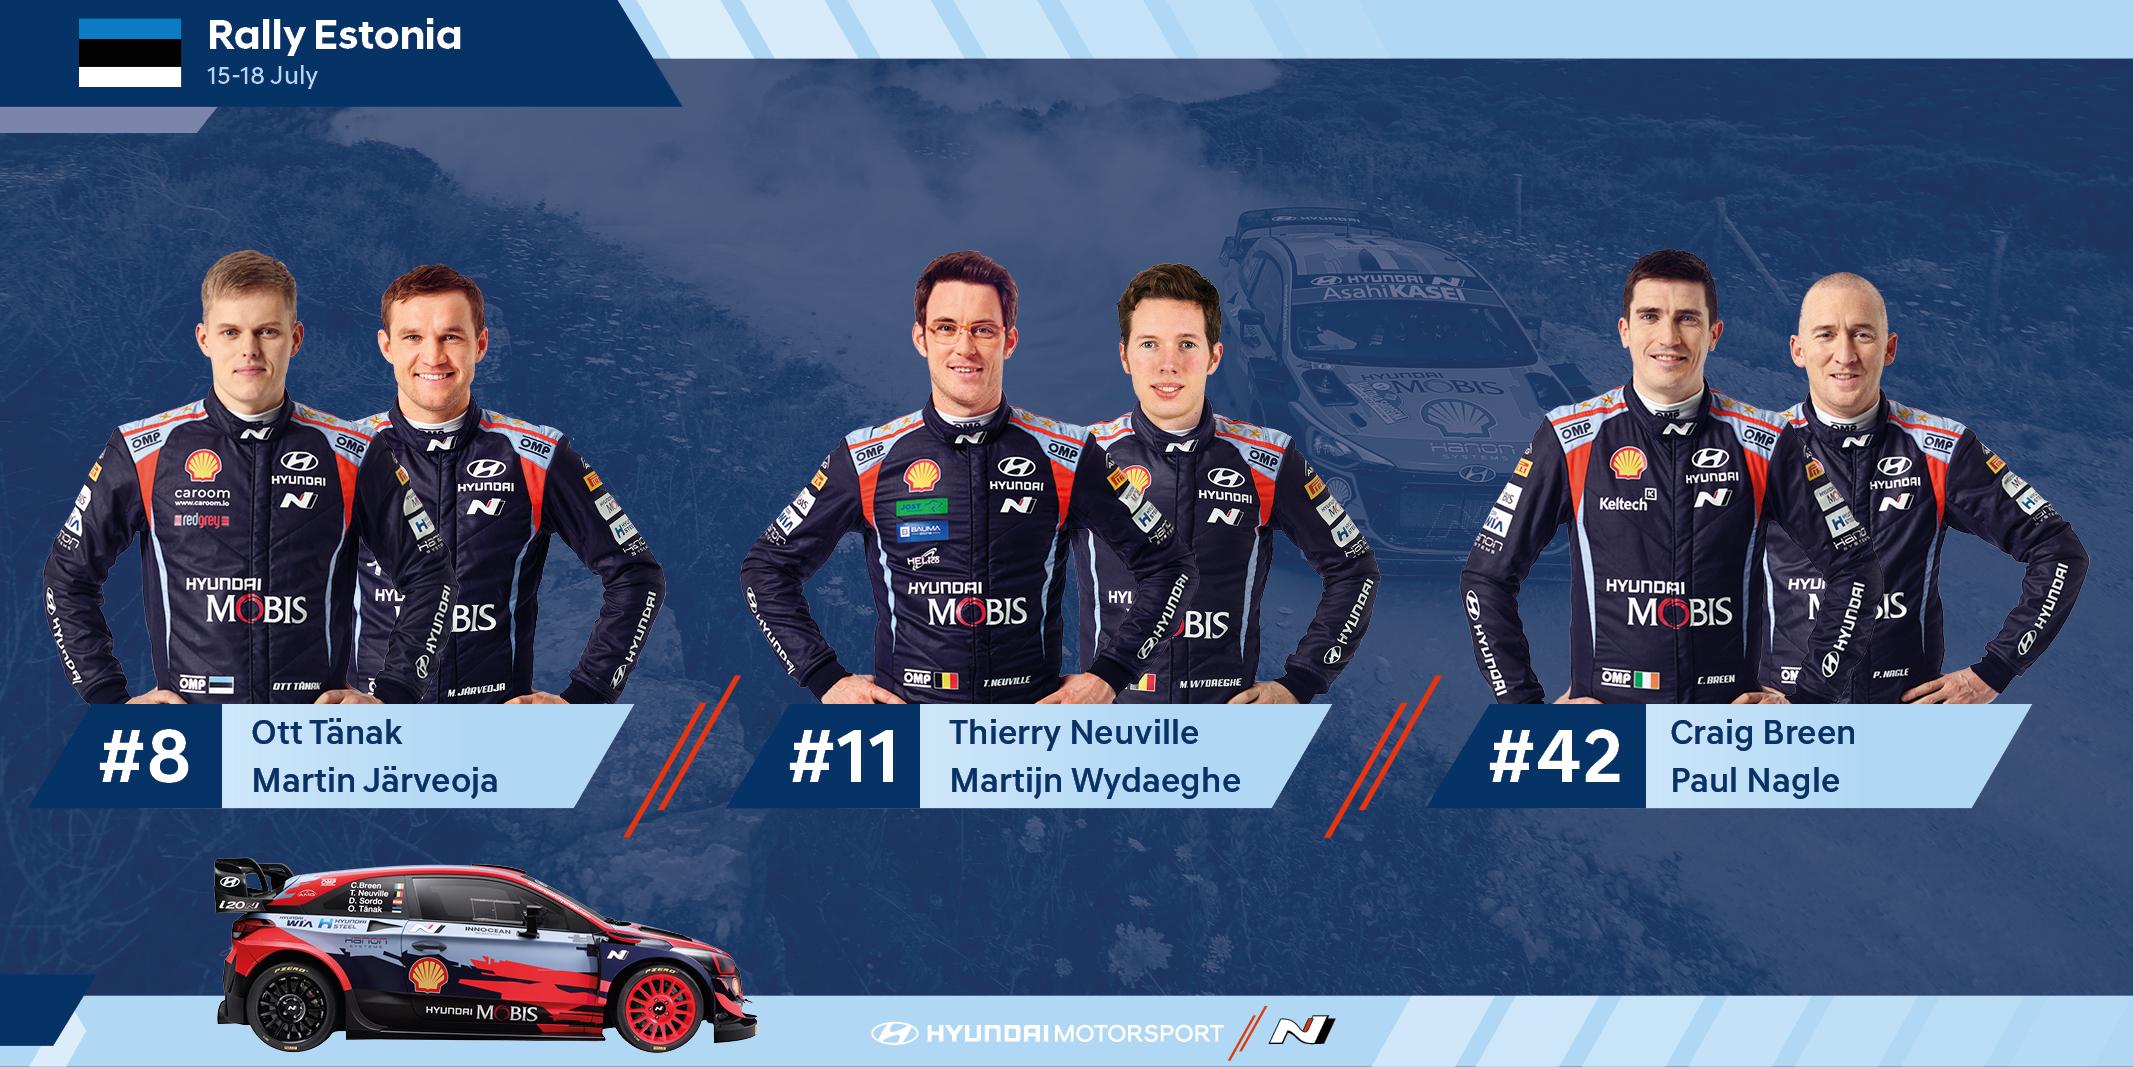 World Rally Championship: Temporada 2021  - Página 28 E3lZuH-WEAQjYky?format=jpg&name=4096x4096